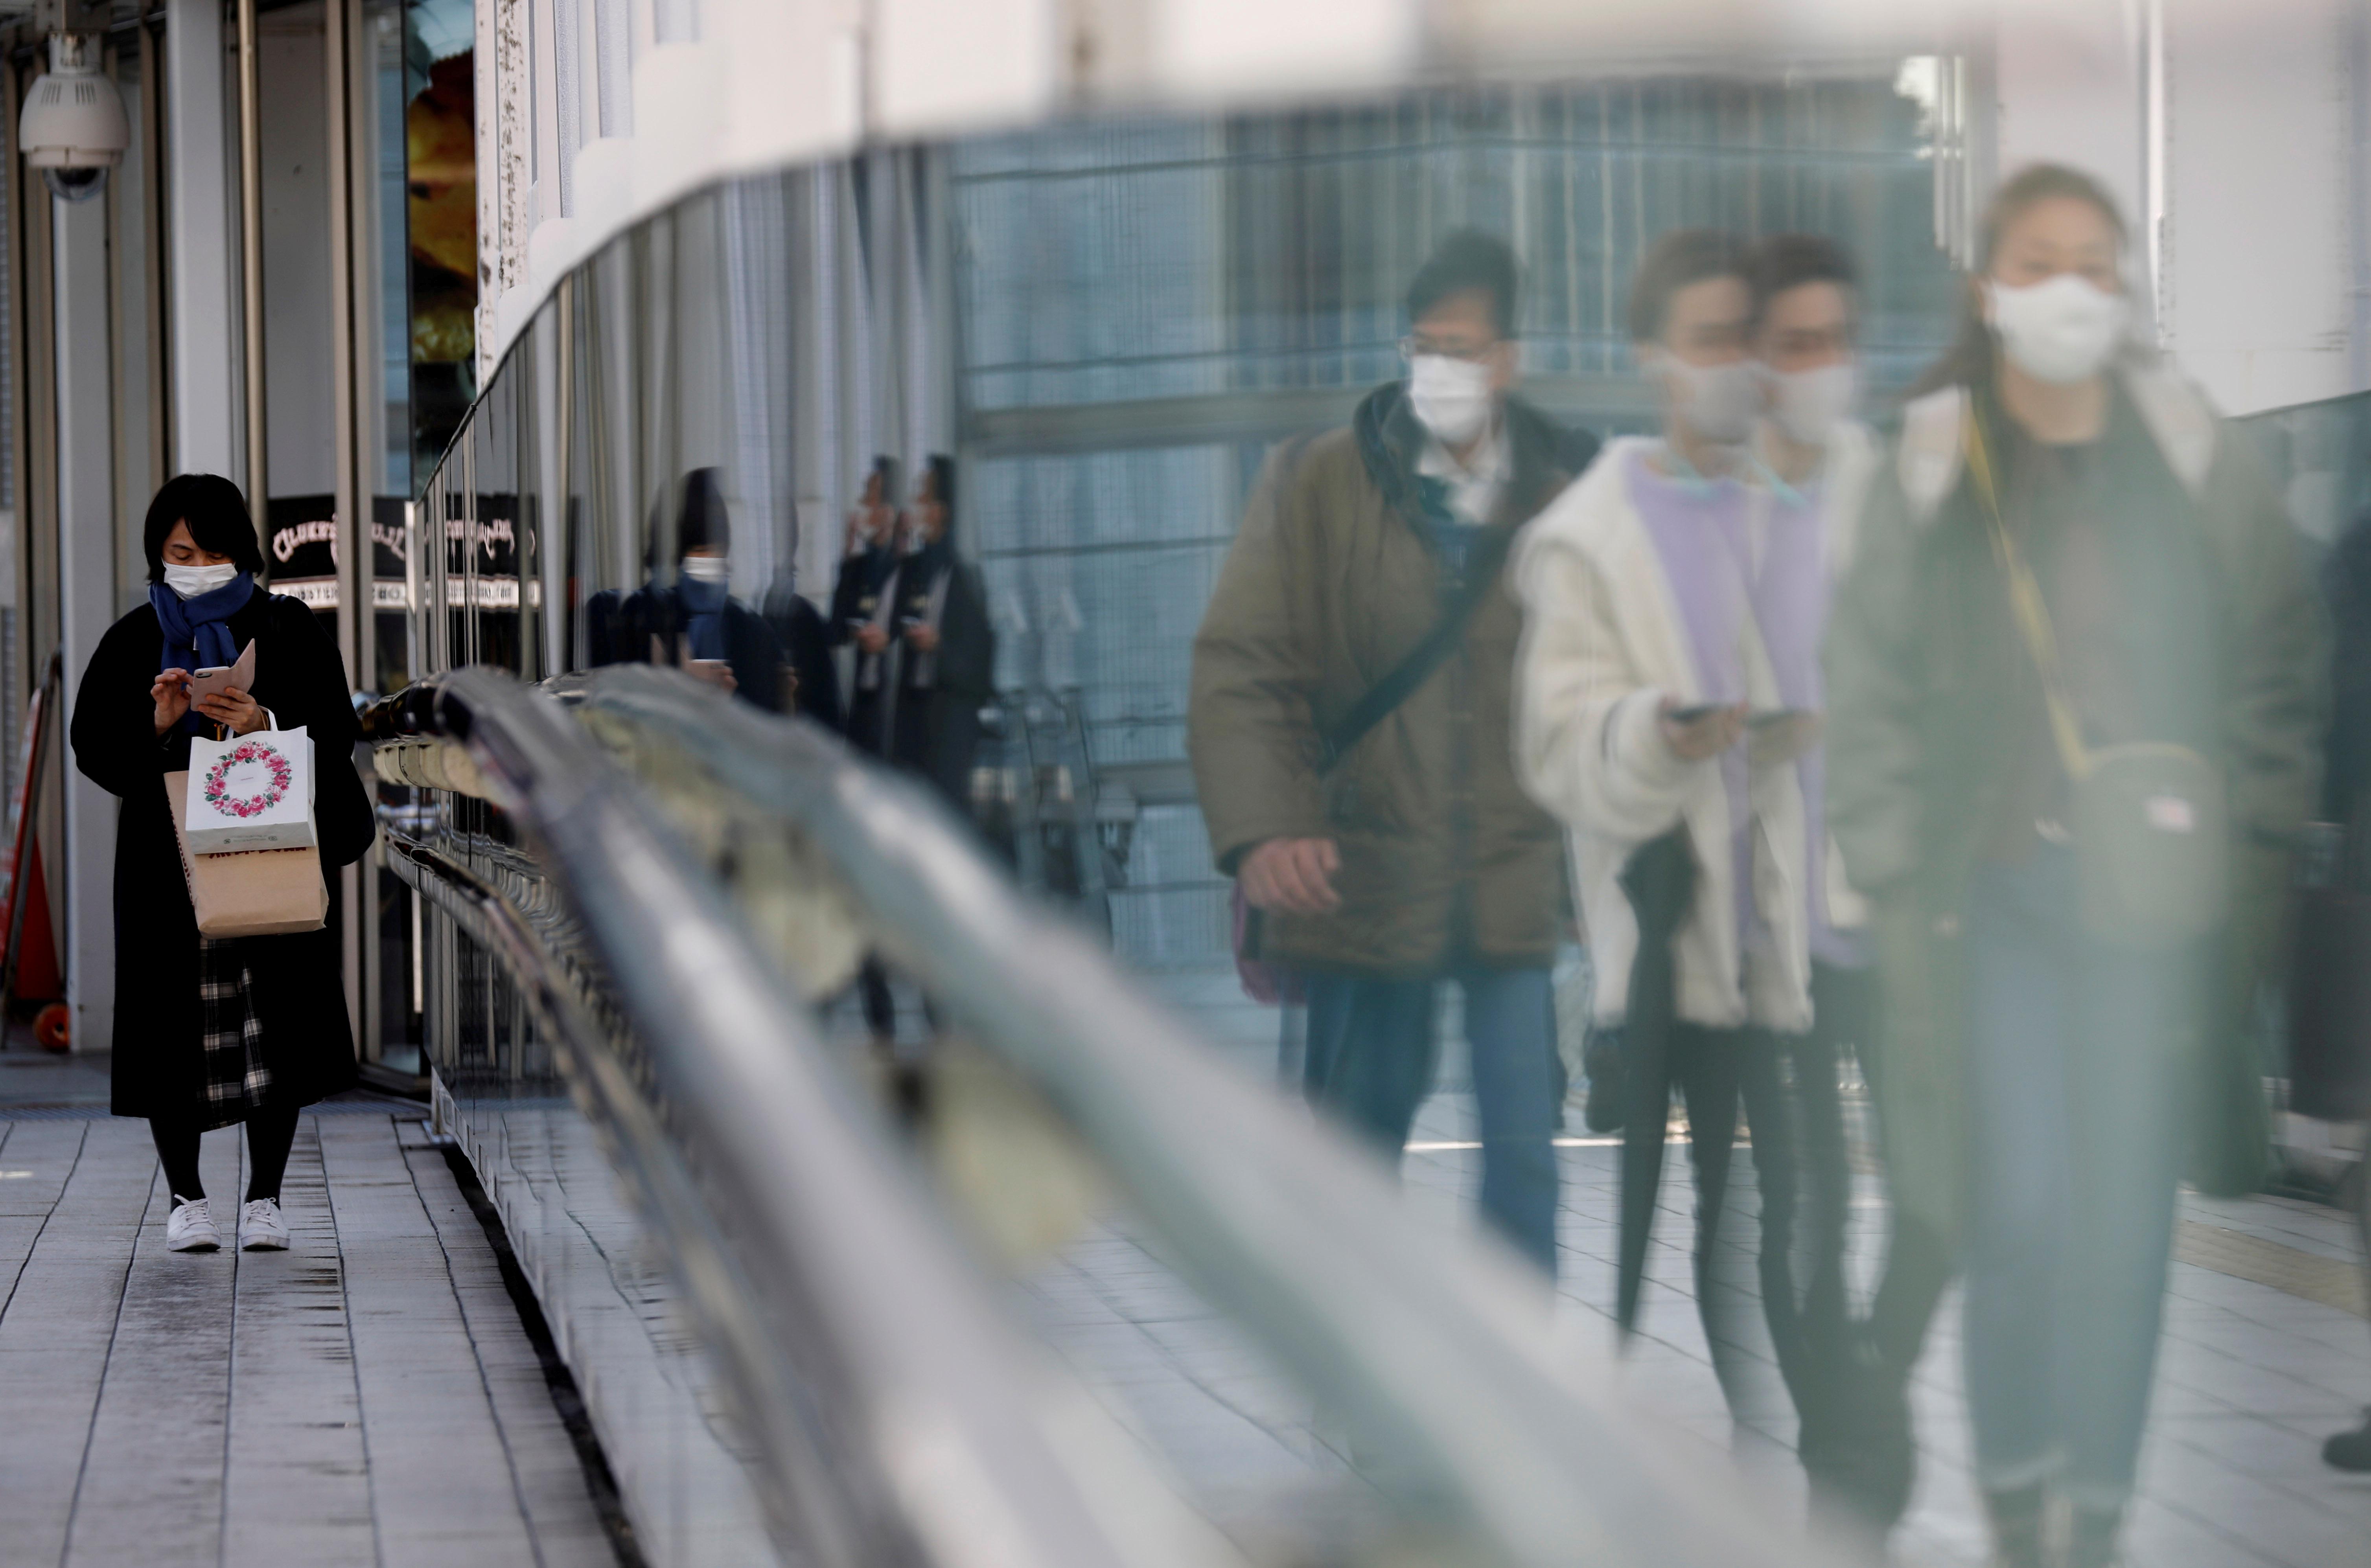 Pedestrians wearing protective masks amid the coronavirus disease (COVID-19) outbreak, walk on a street in Tokyo, Japan, February 2, 2021. REUTERS/Kim Kyung-Hoon/File Photo